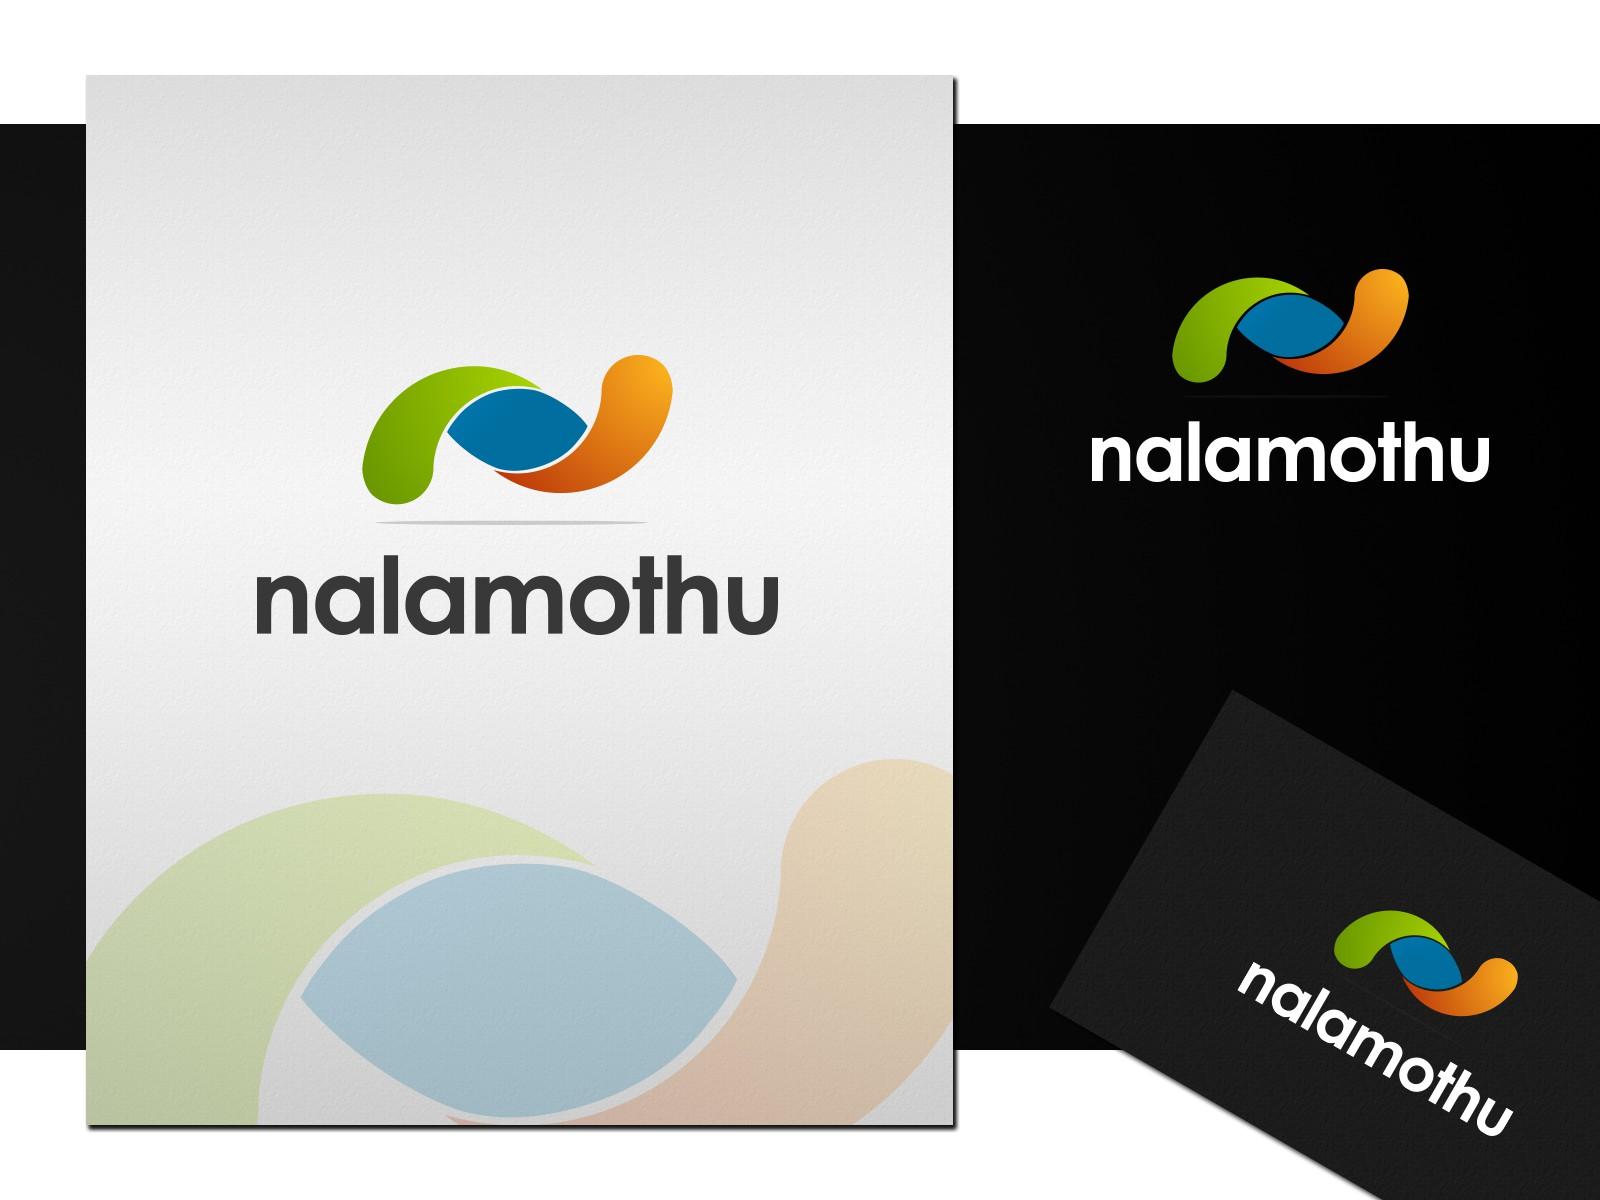 Nalamothu websites need a new logo